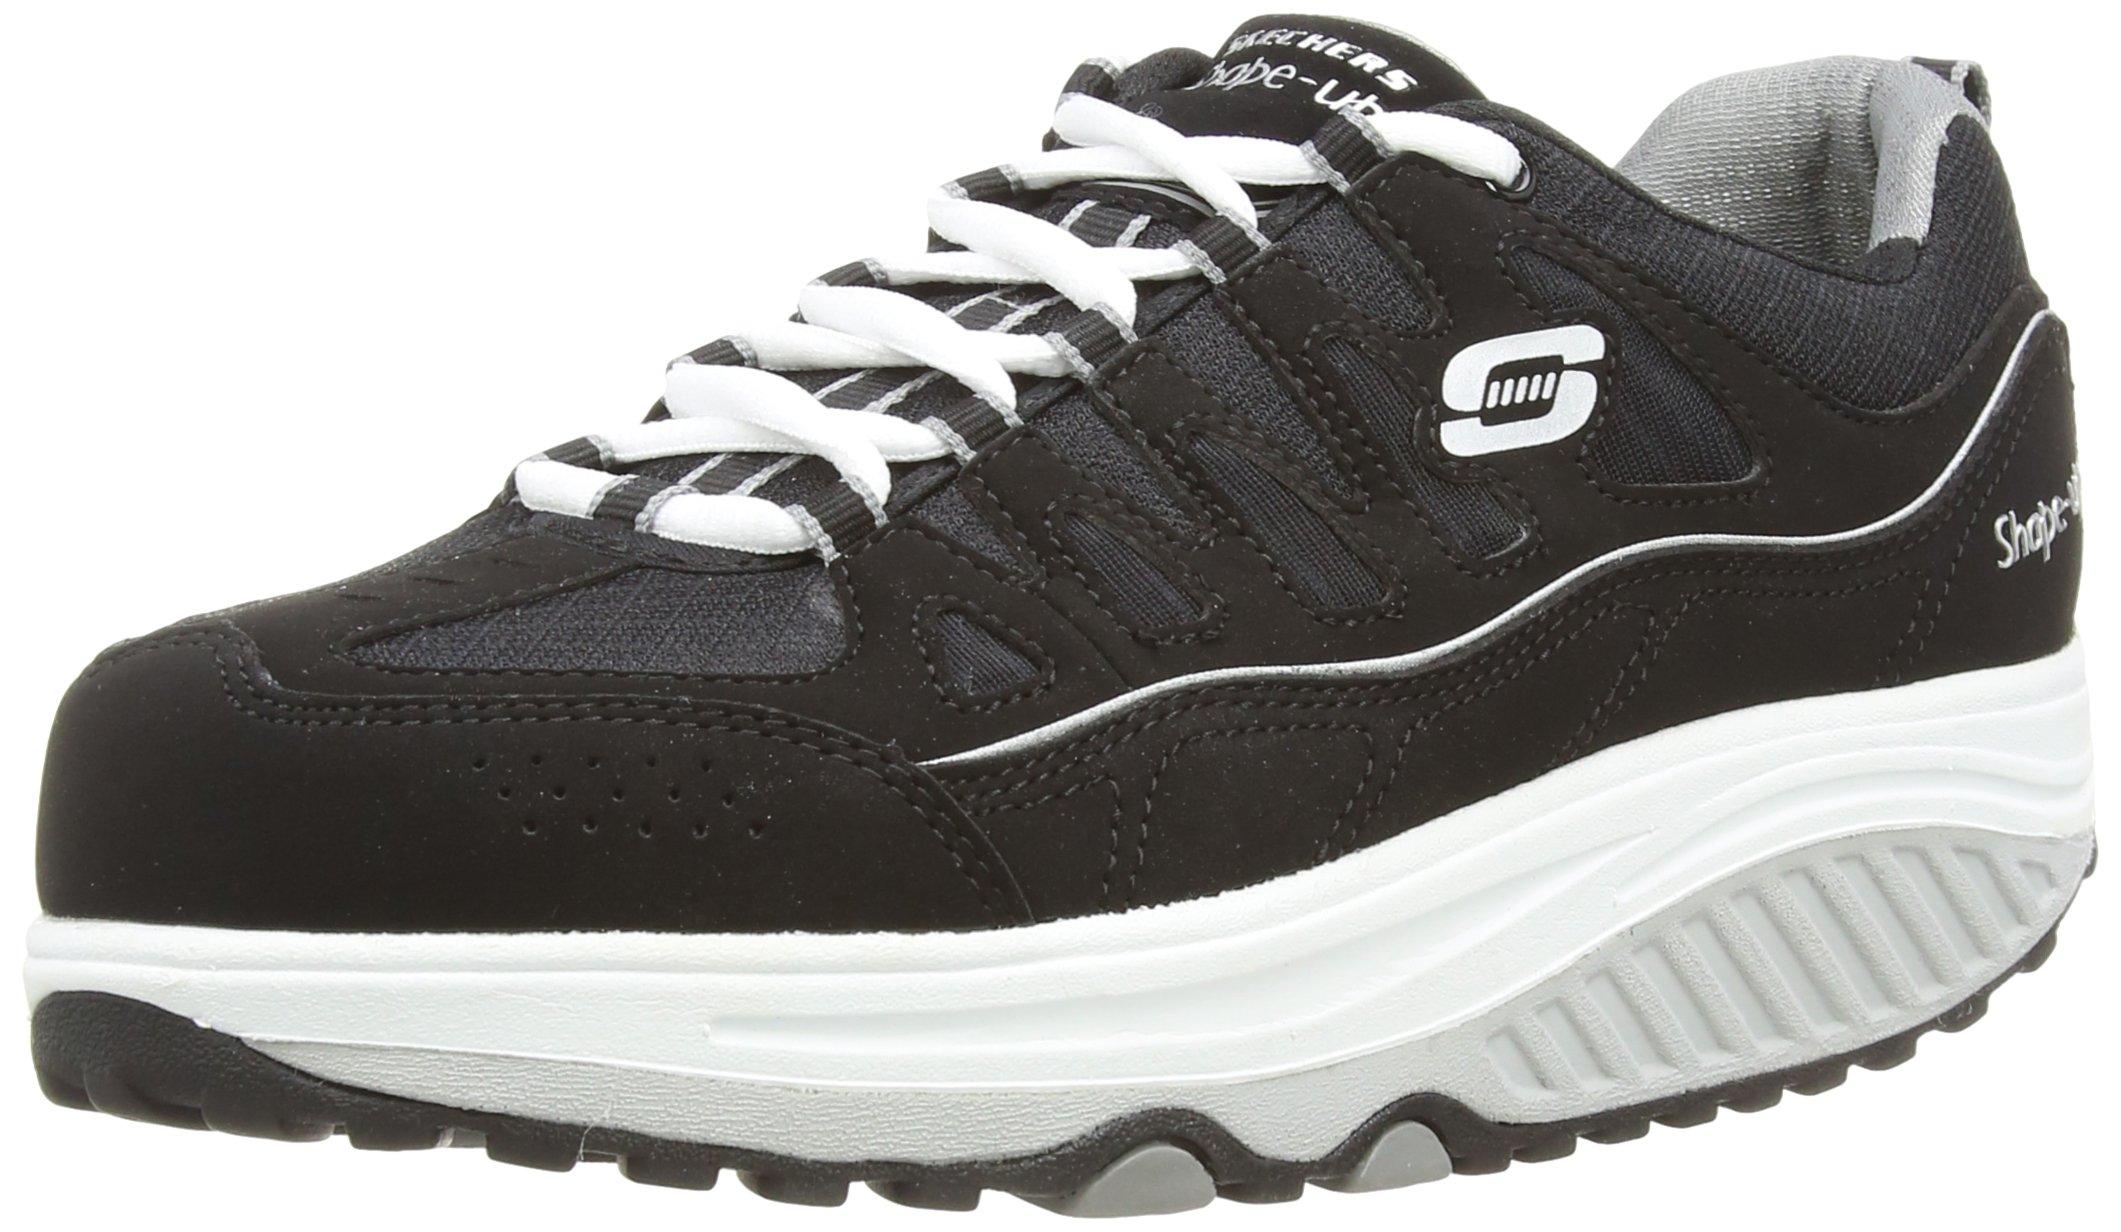 Skechers Women's Shape UPS 2.0 Comfort Stride Fashion Sneaker, Black/White, 6 M US